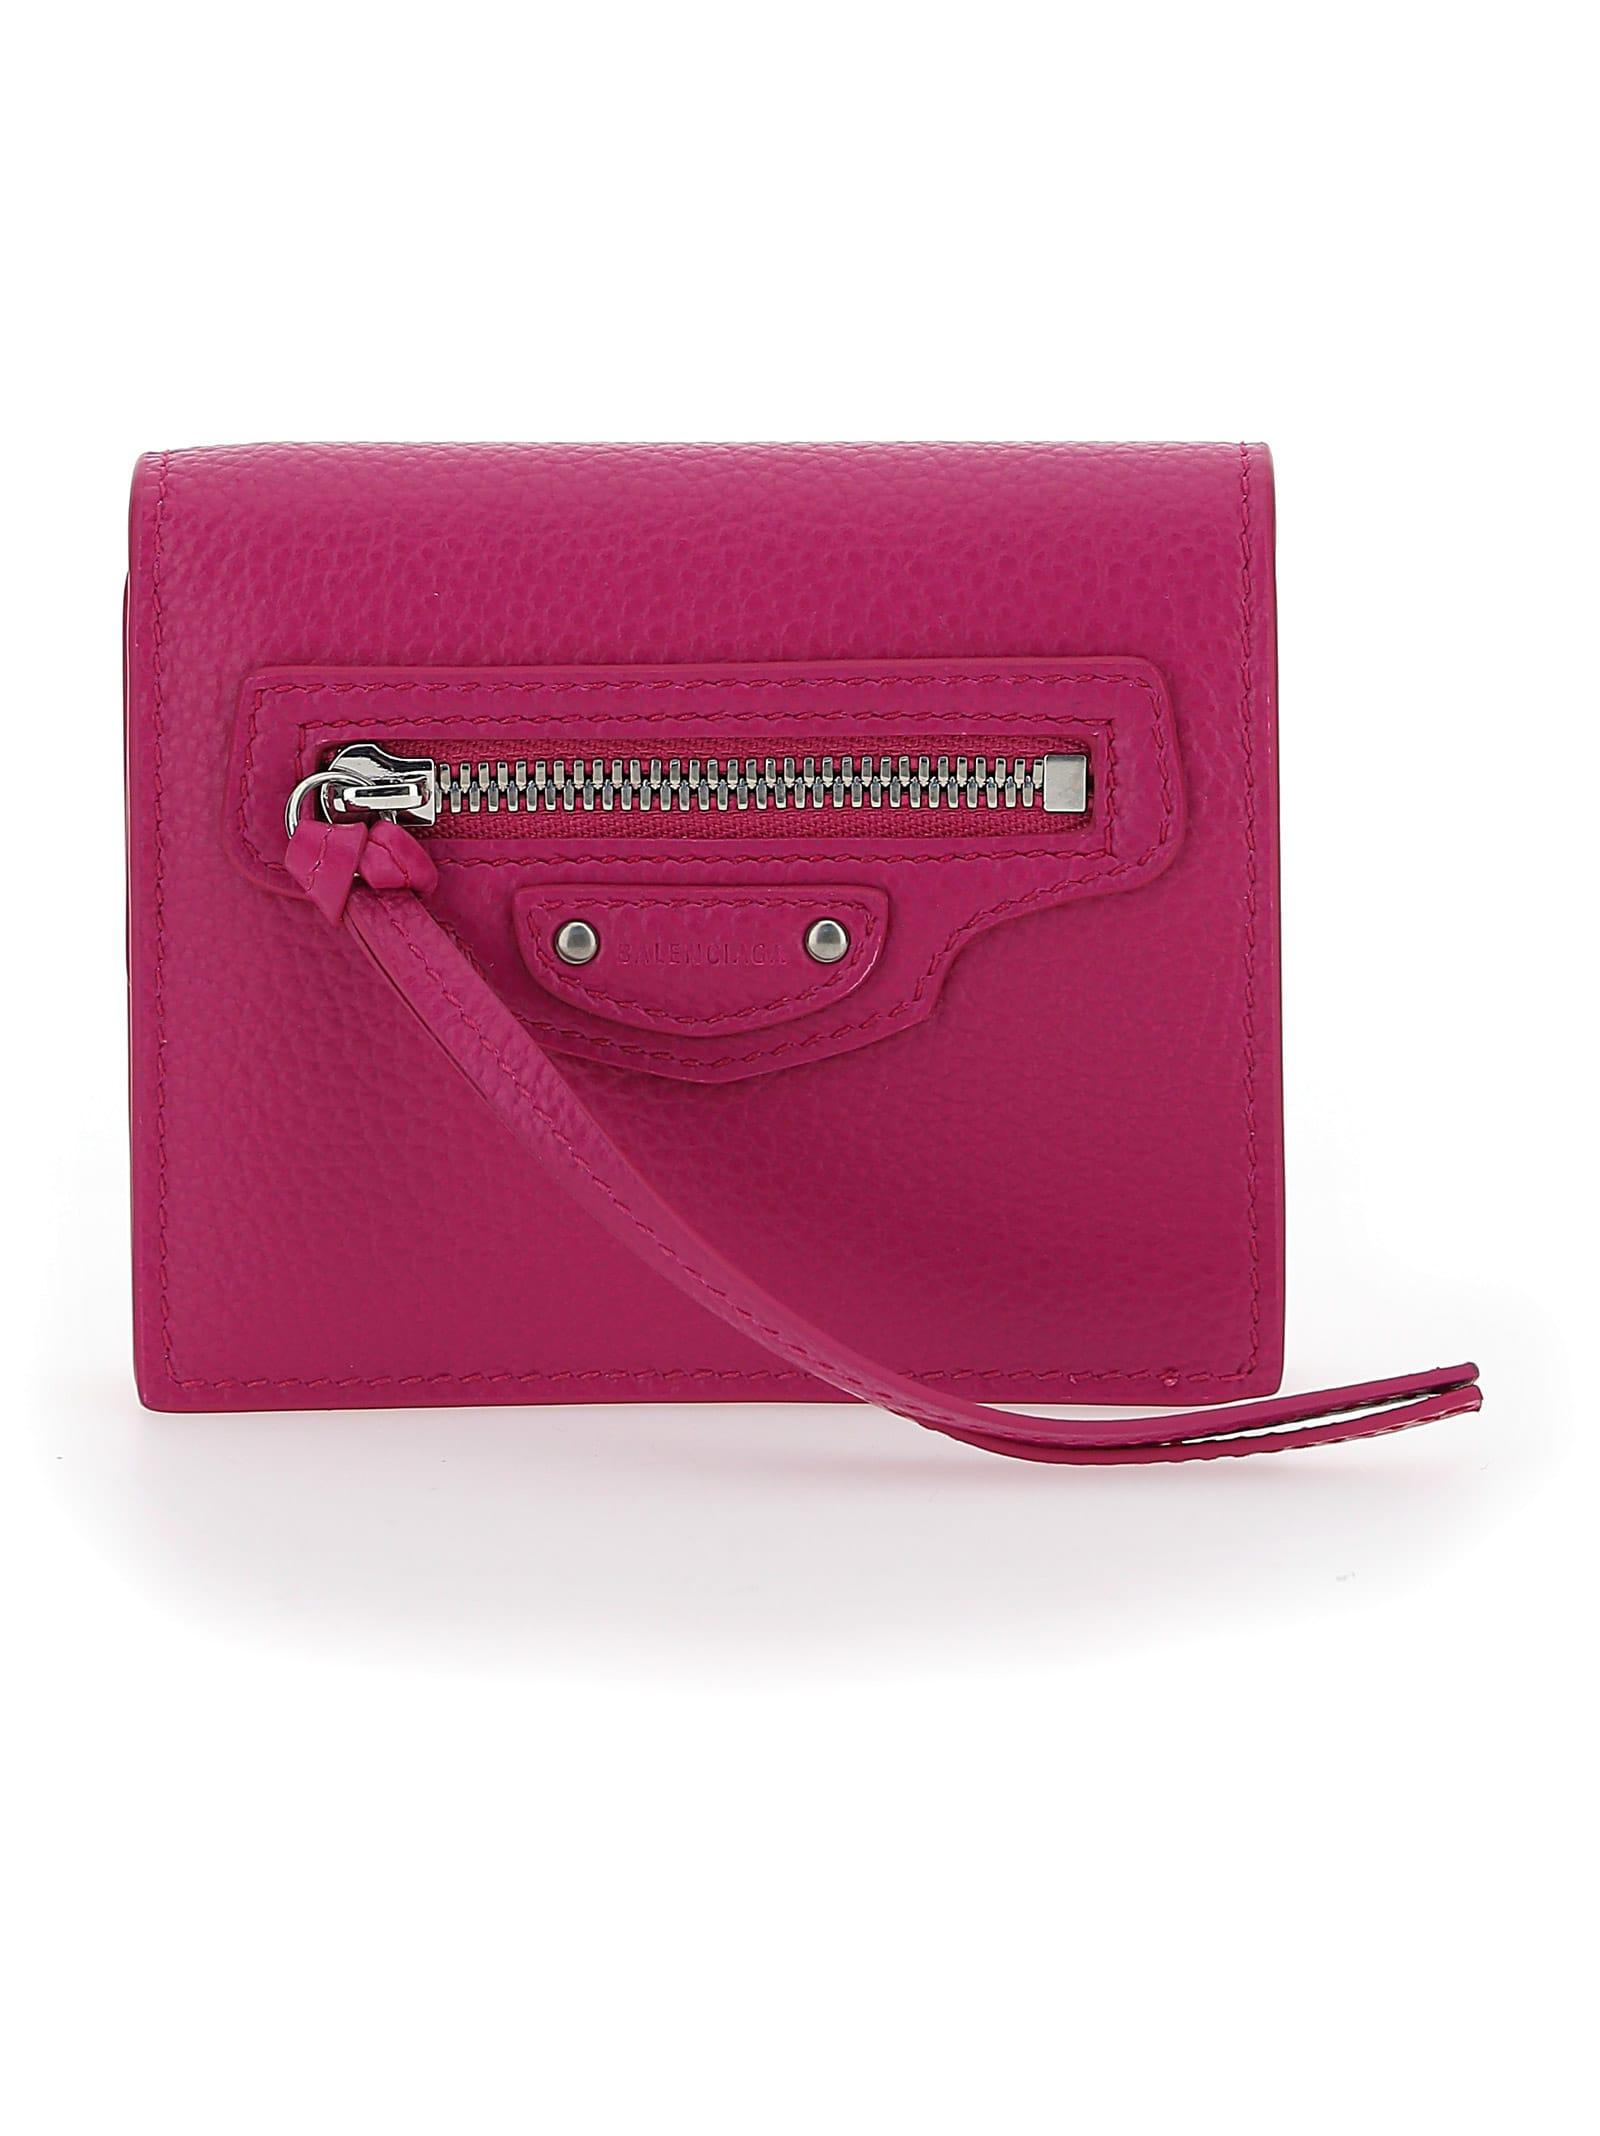 Balenciaga Wallets WALLET